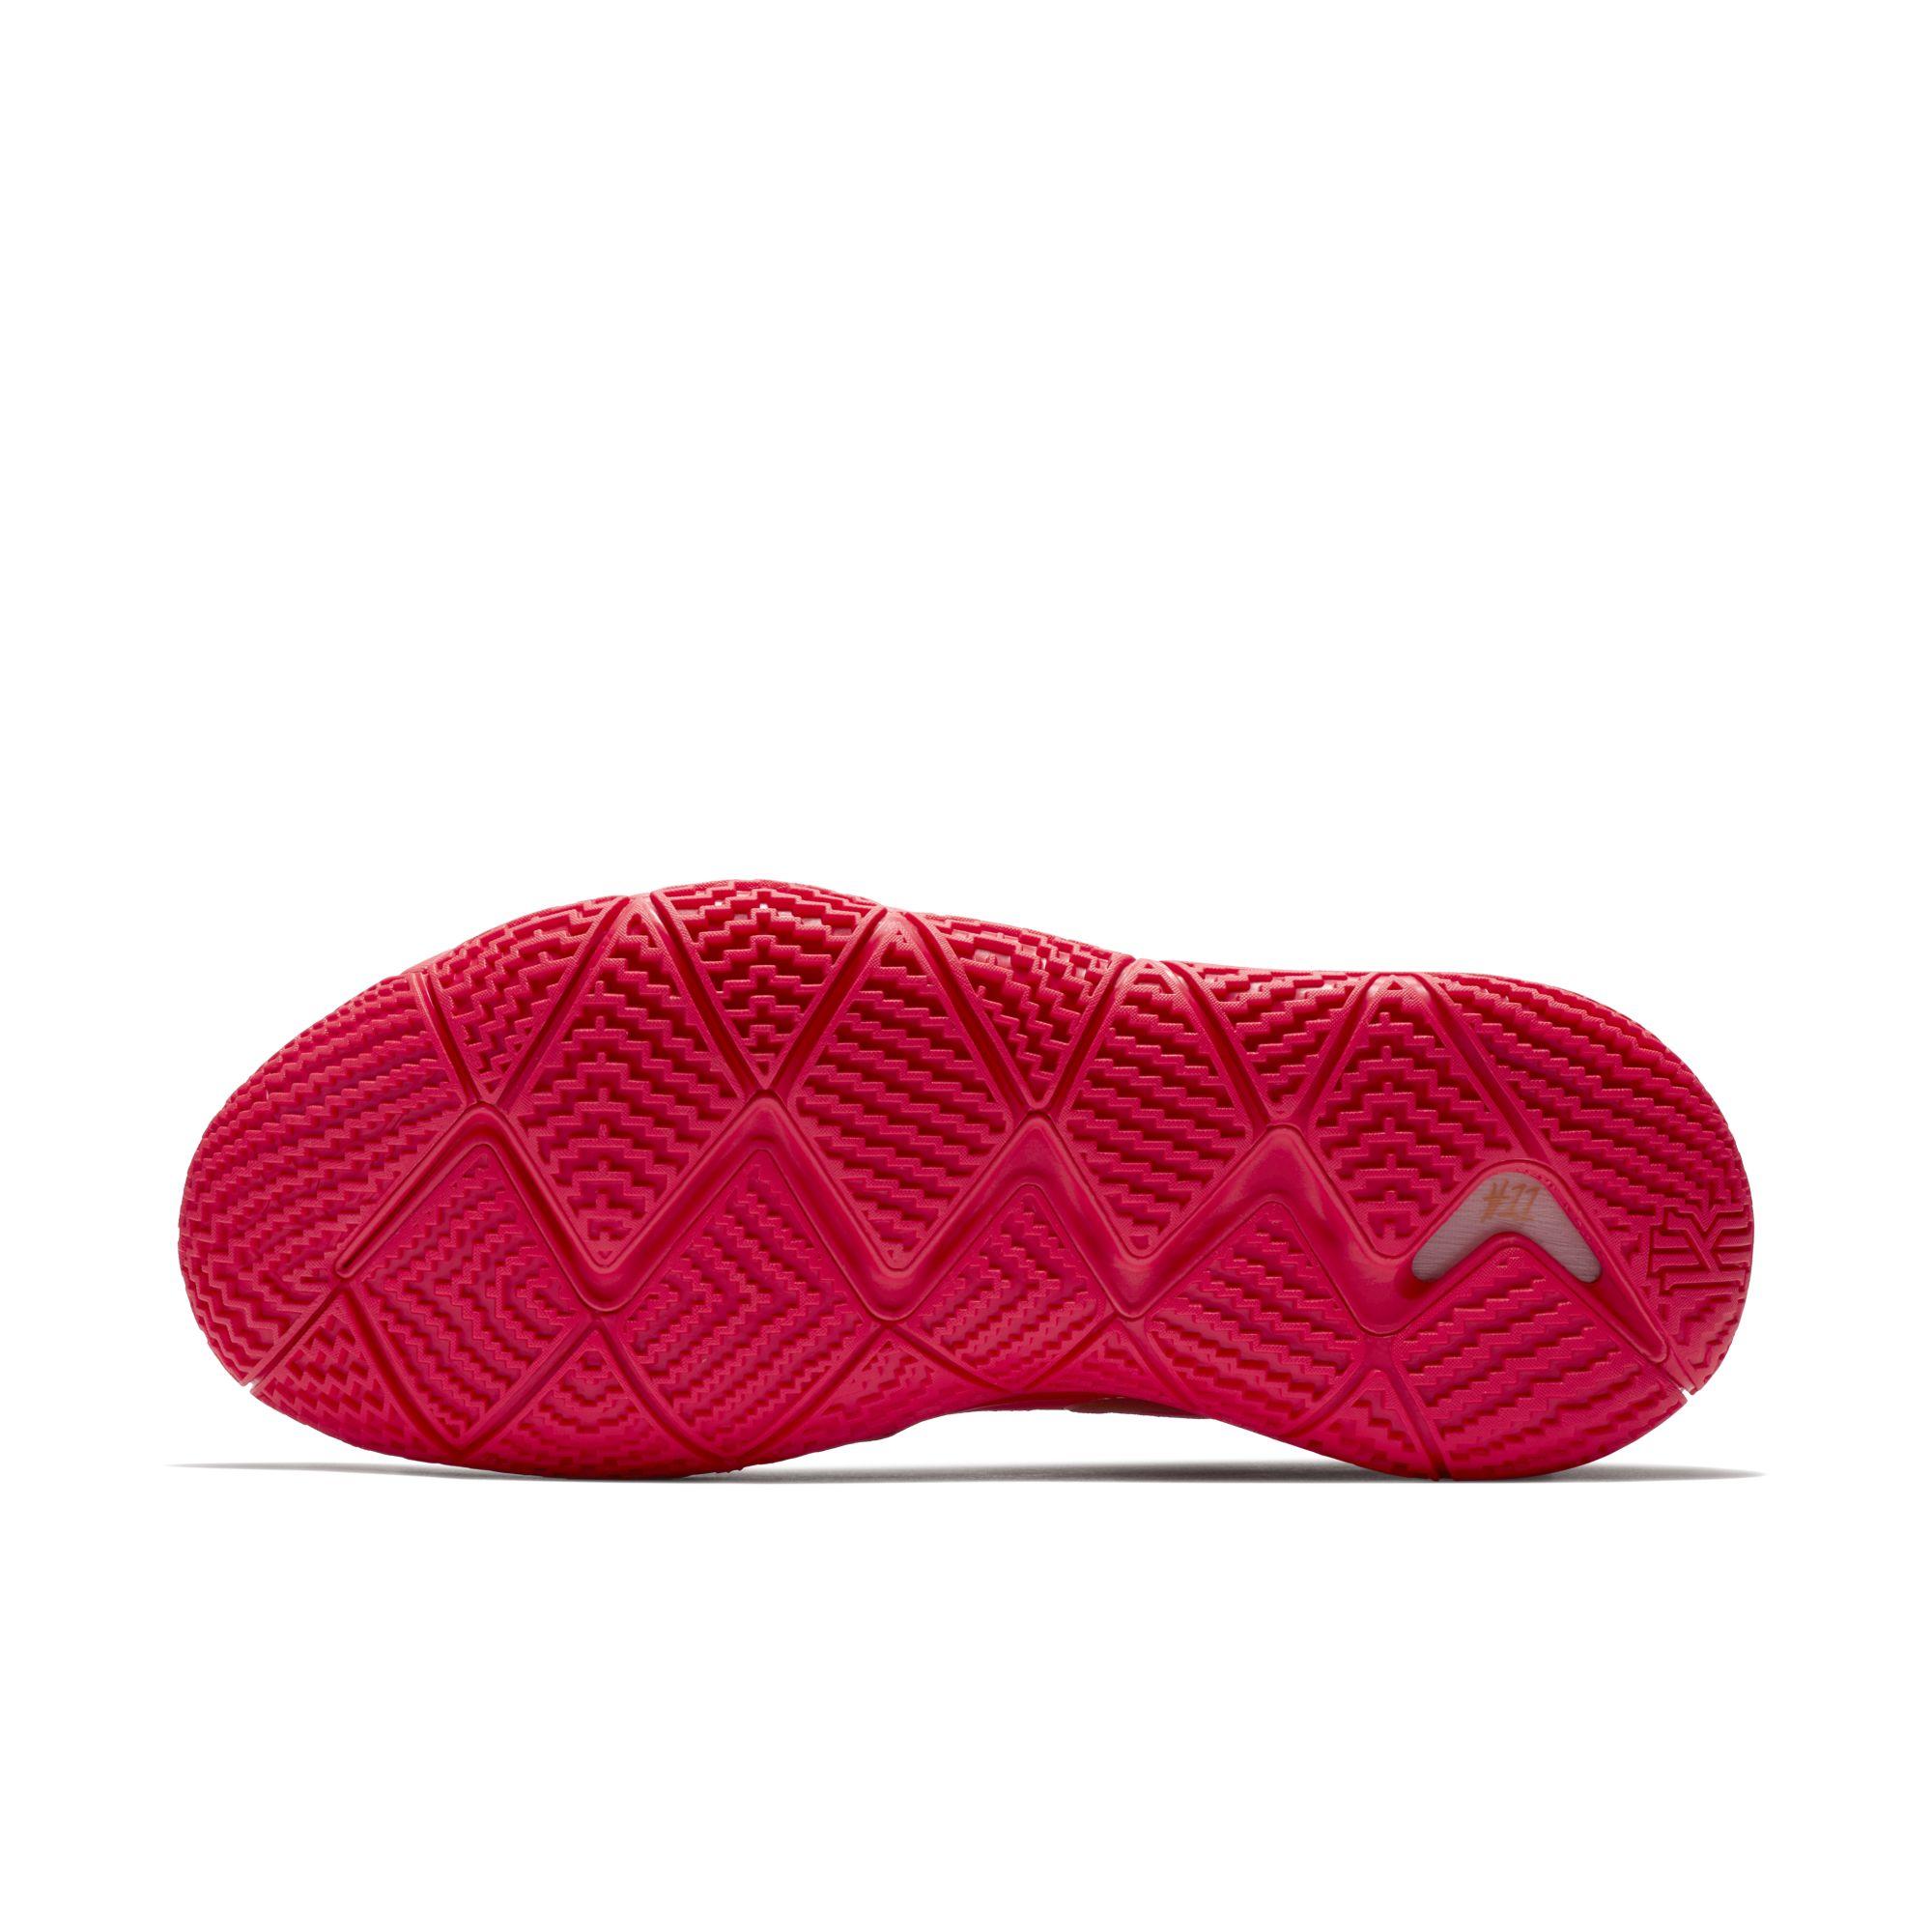 kyrie 5 red carpet